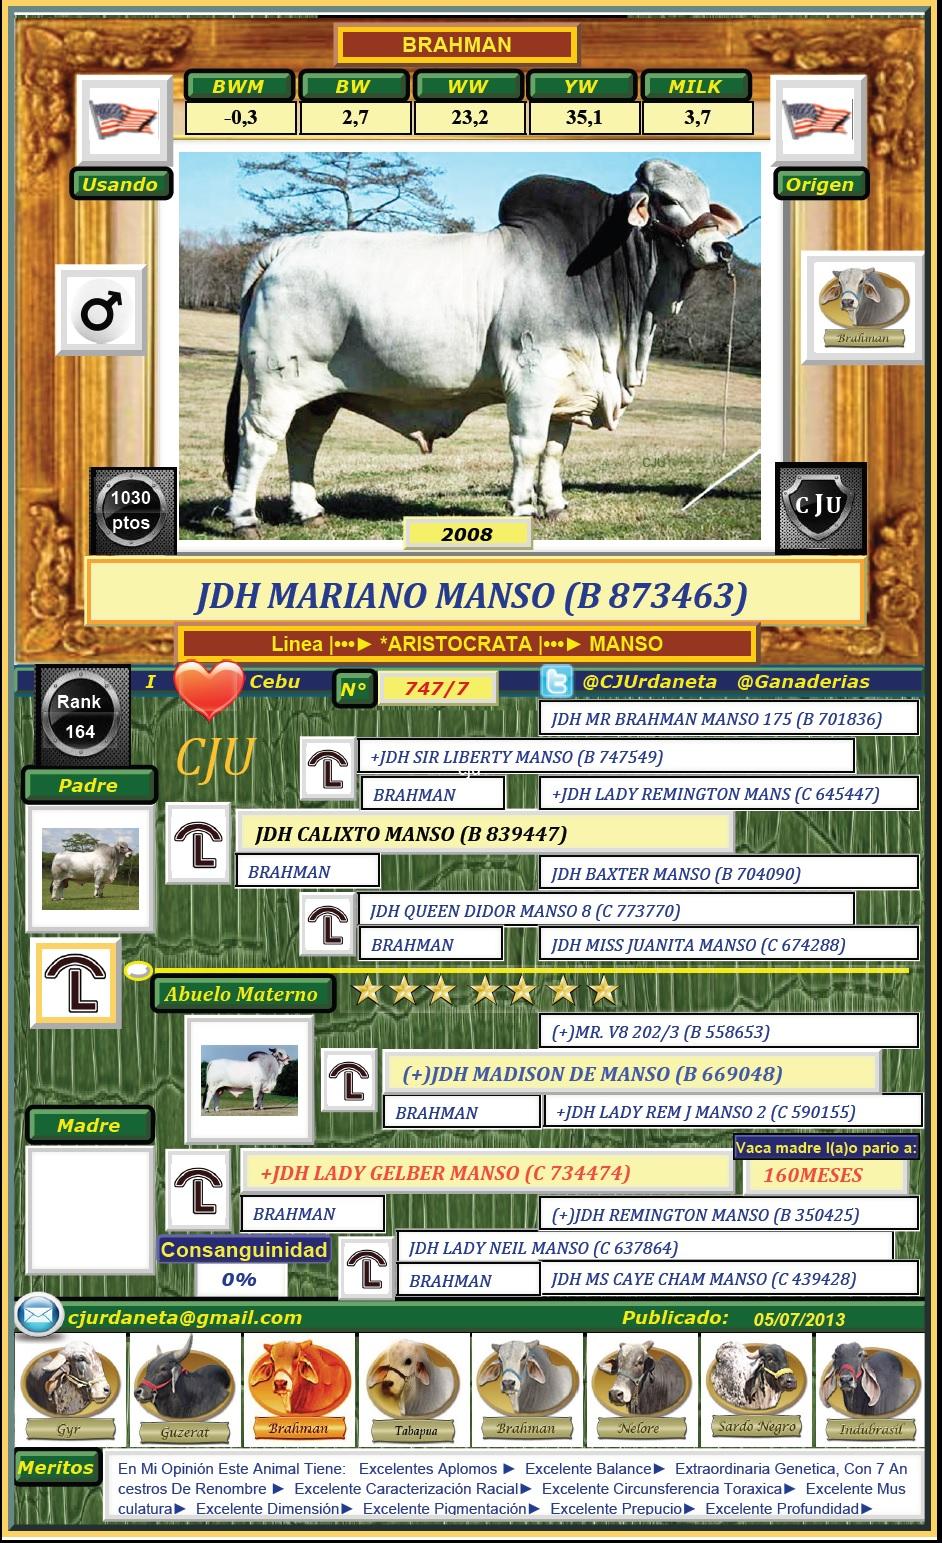 JDH MARIANO MANSO (B 873463)